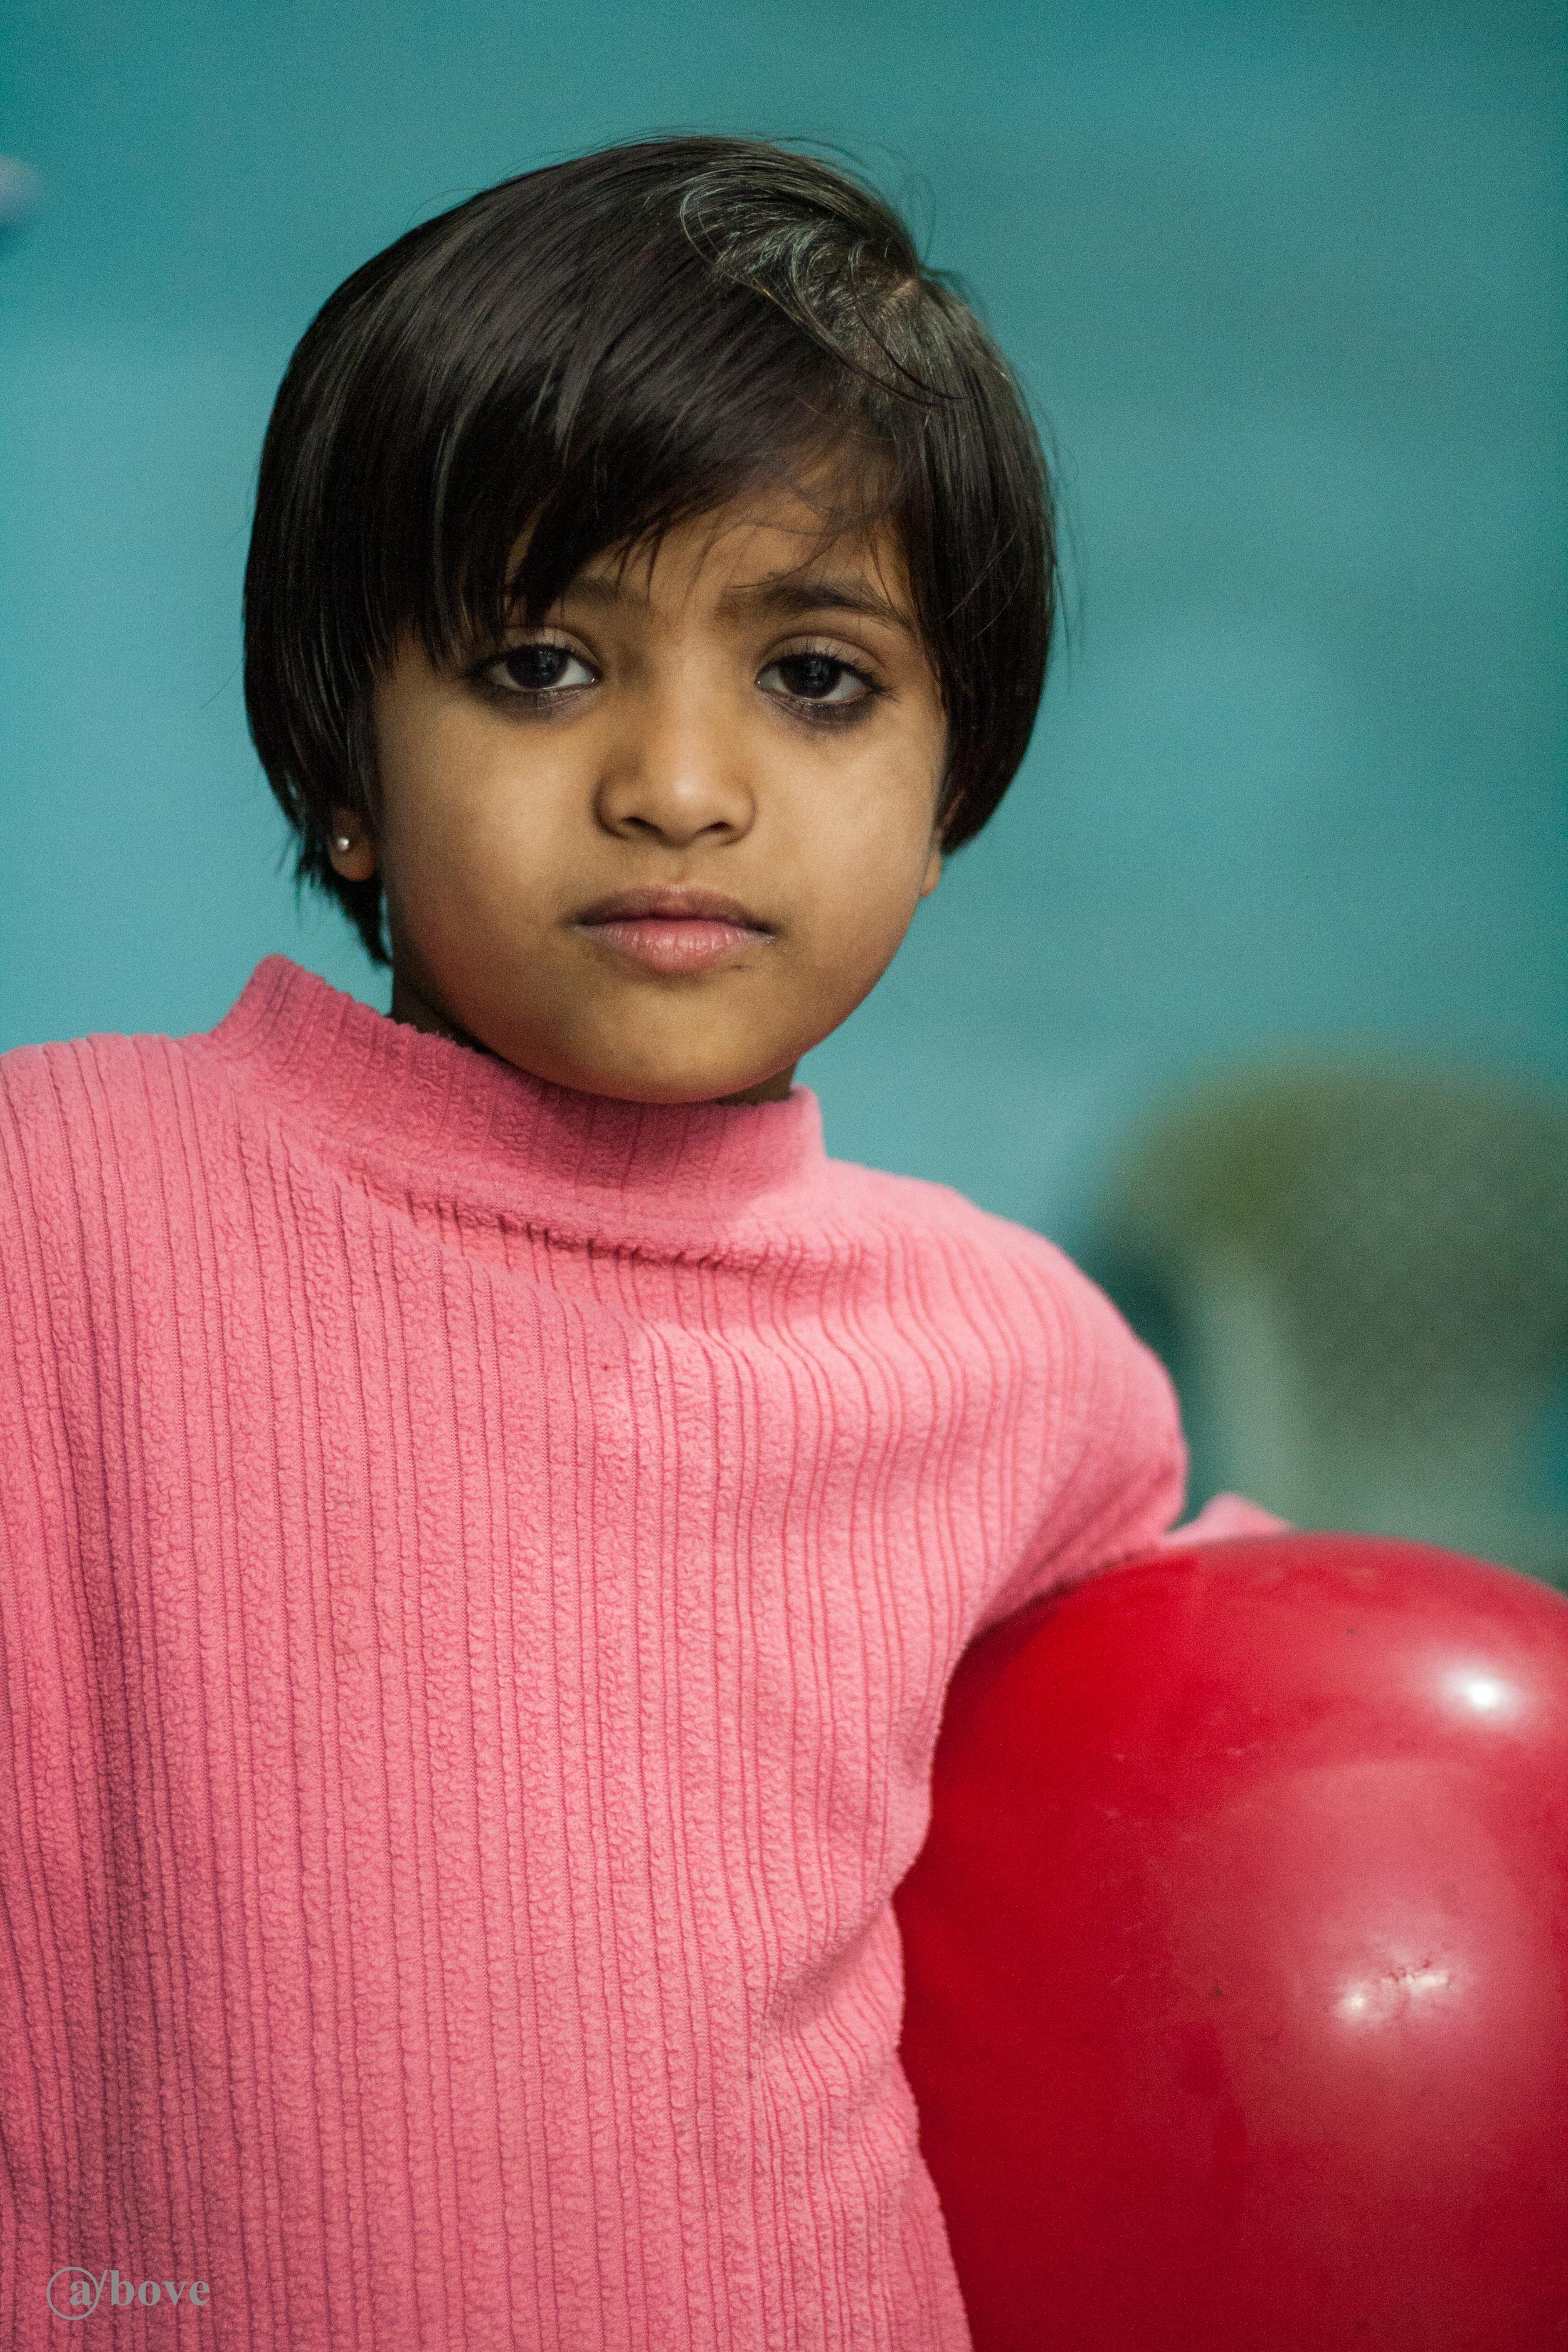 Portraits of India_23.jpg